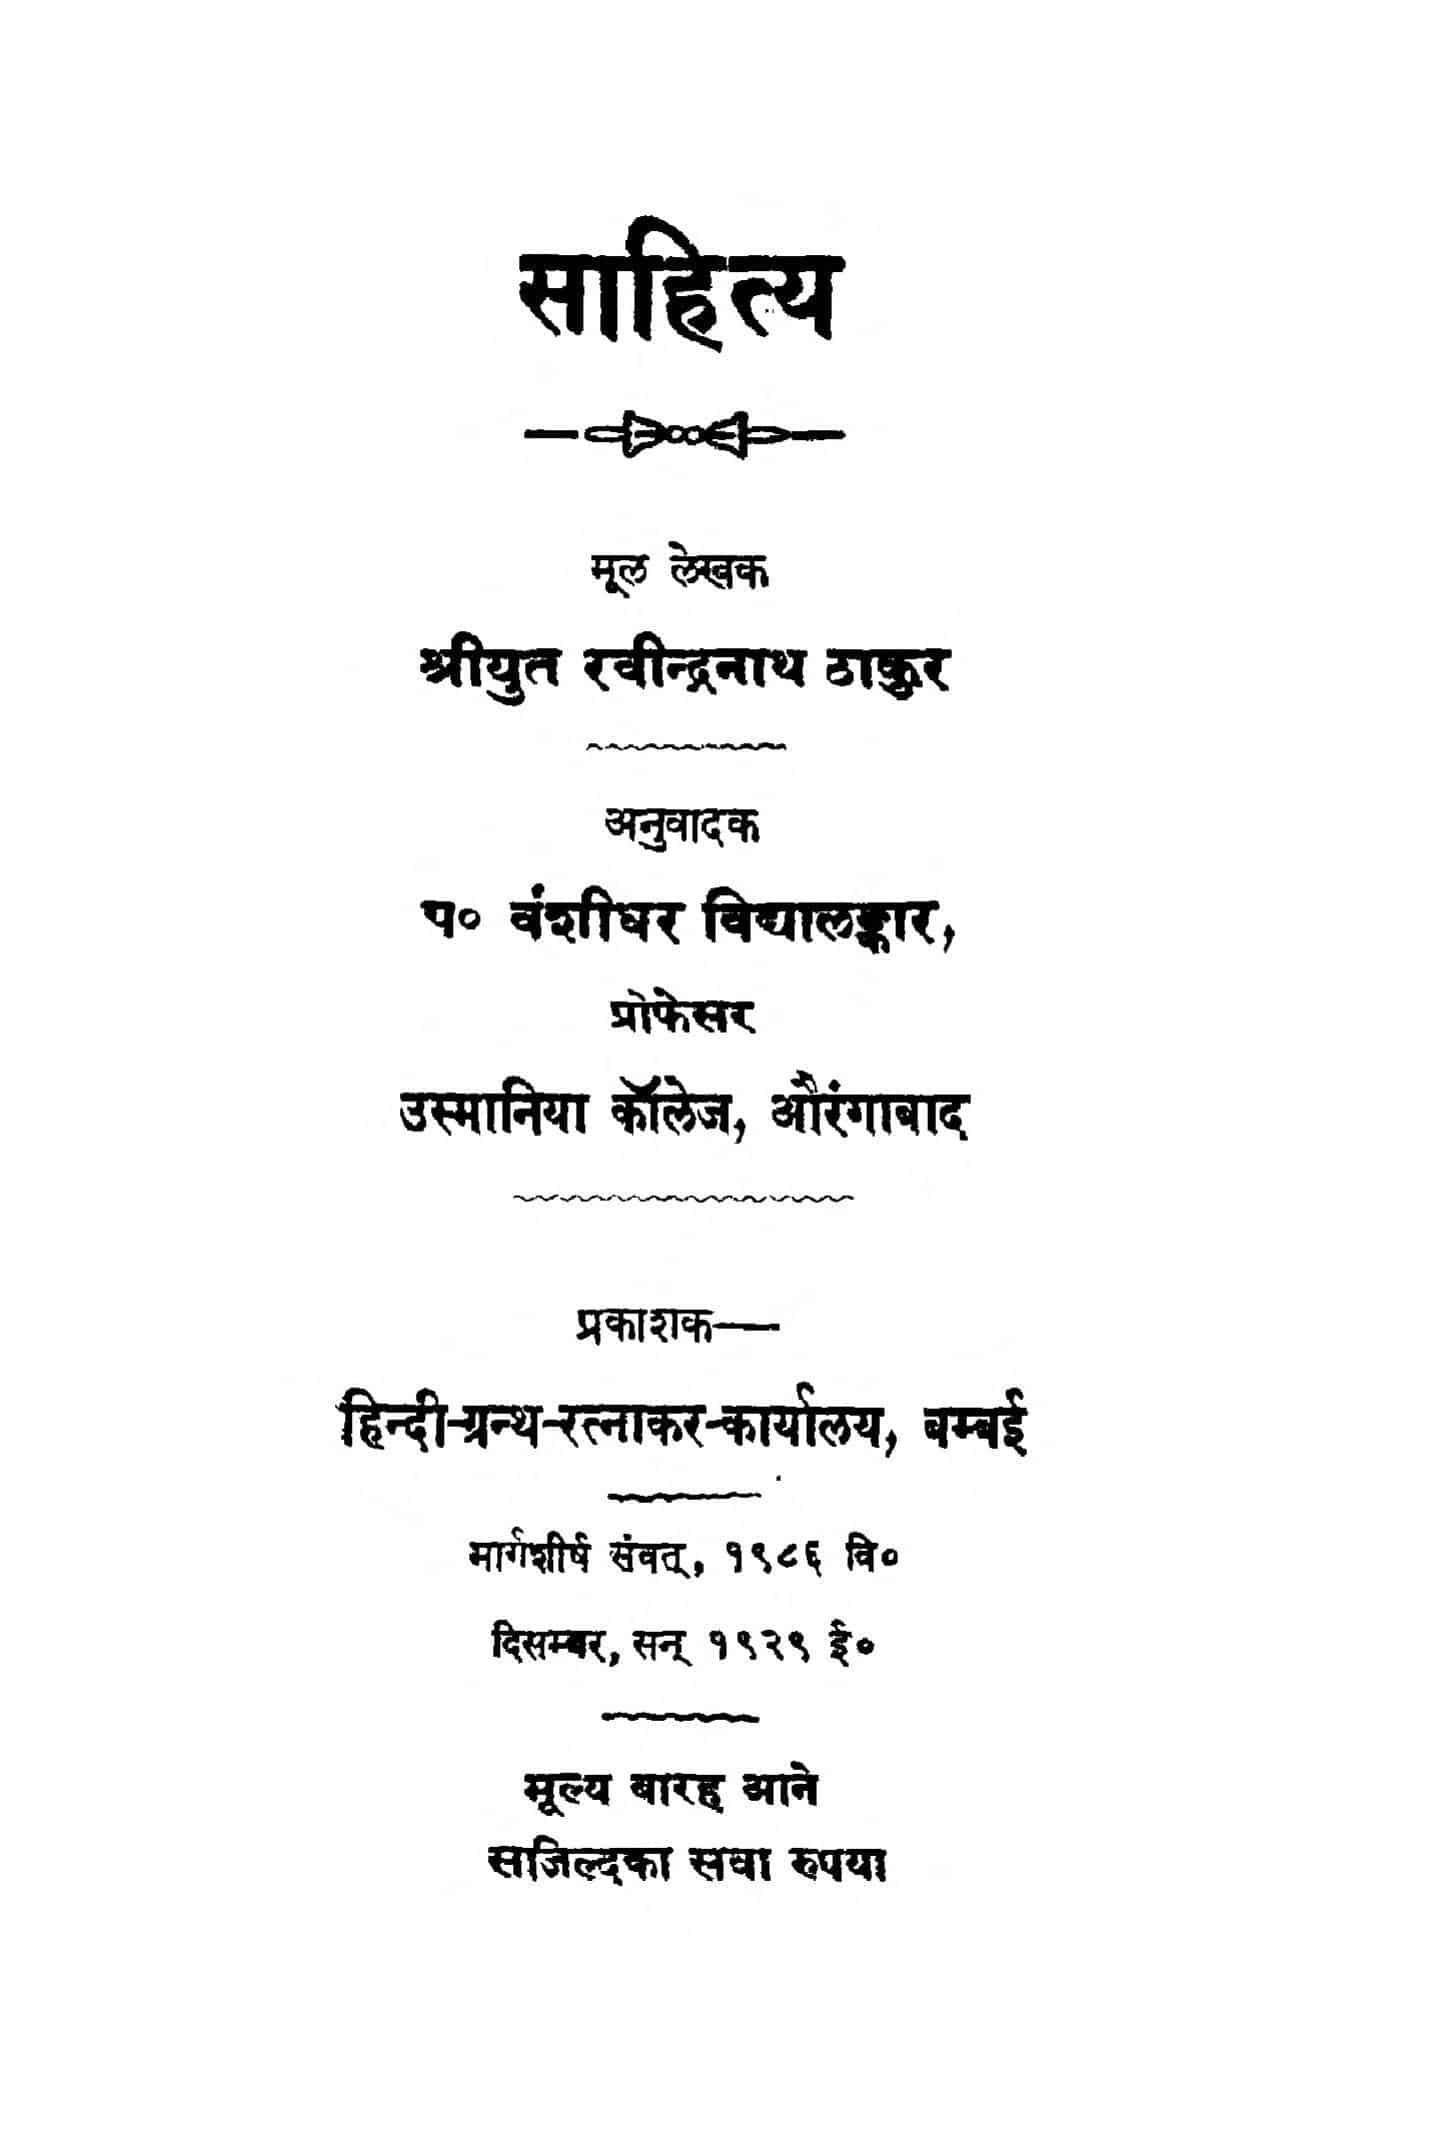 sahity by रवीन्द्रनाथ ठाकुर - Ravindranath Thakur